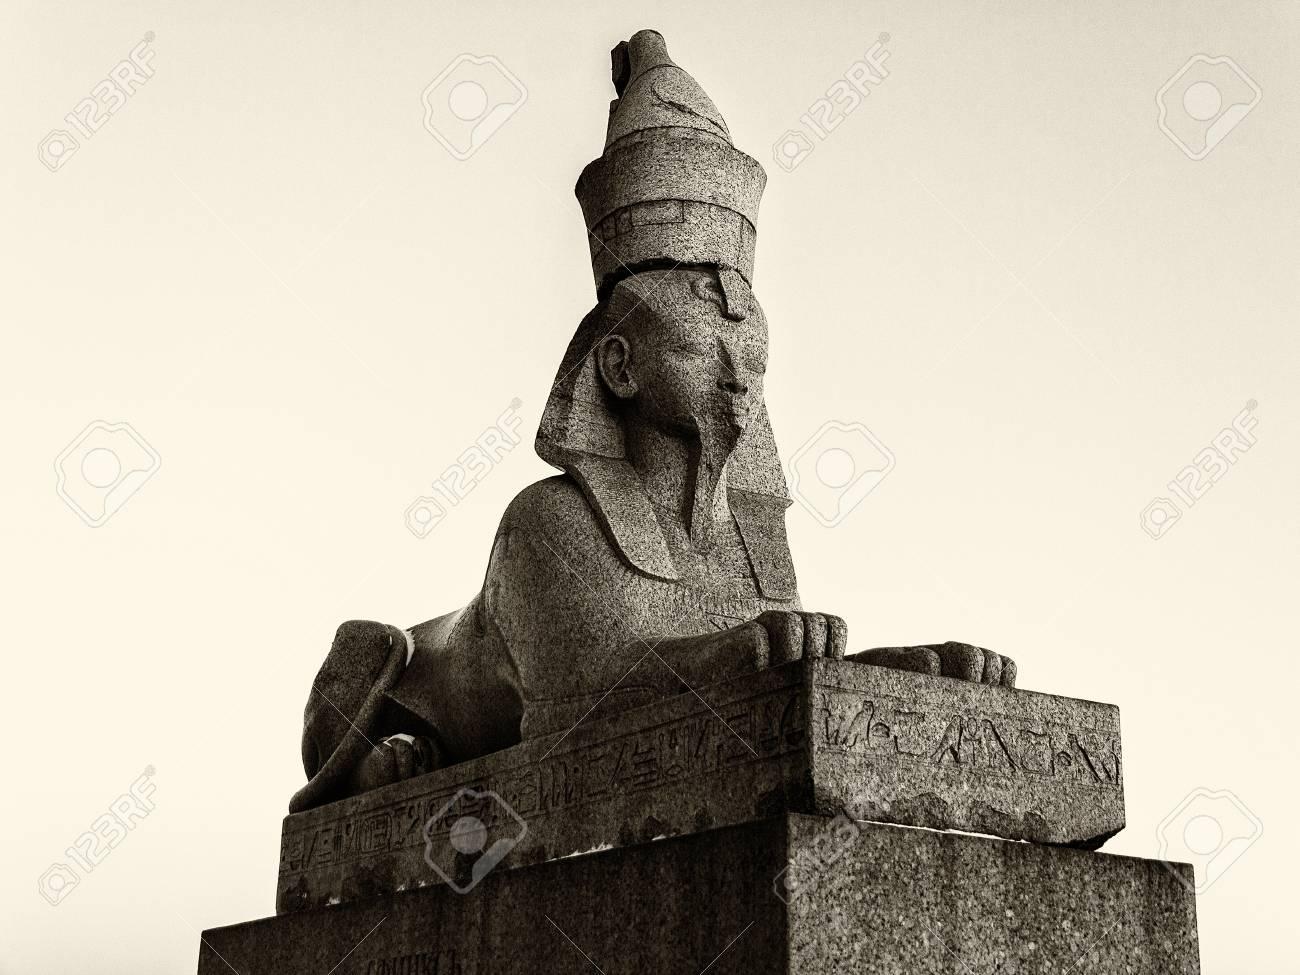 Sphinx in St. Petersburg: overview, description, history, location 93